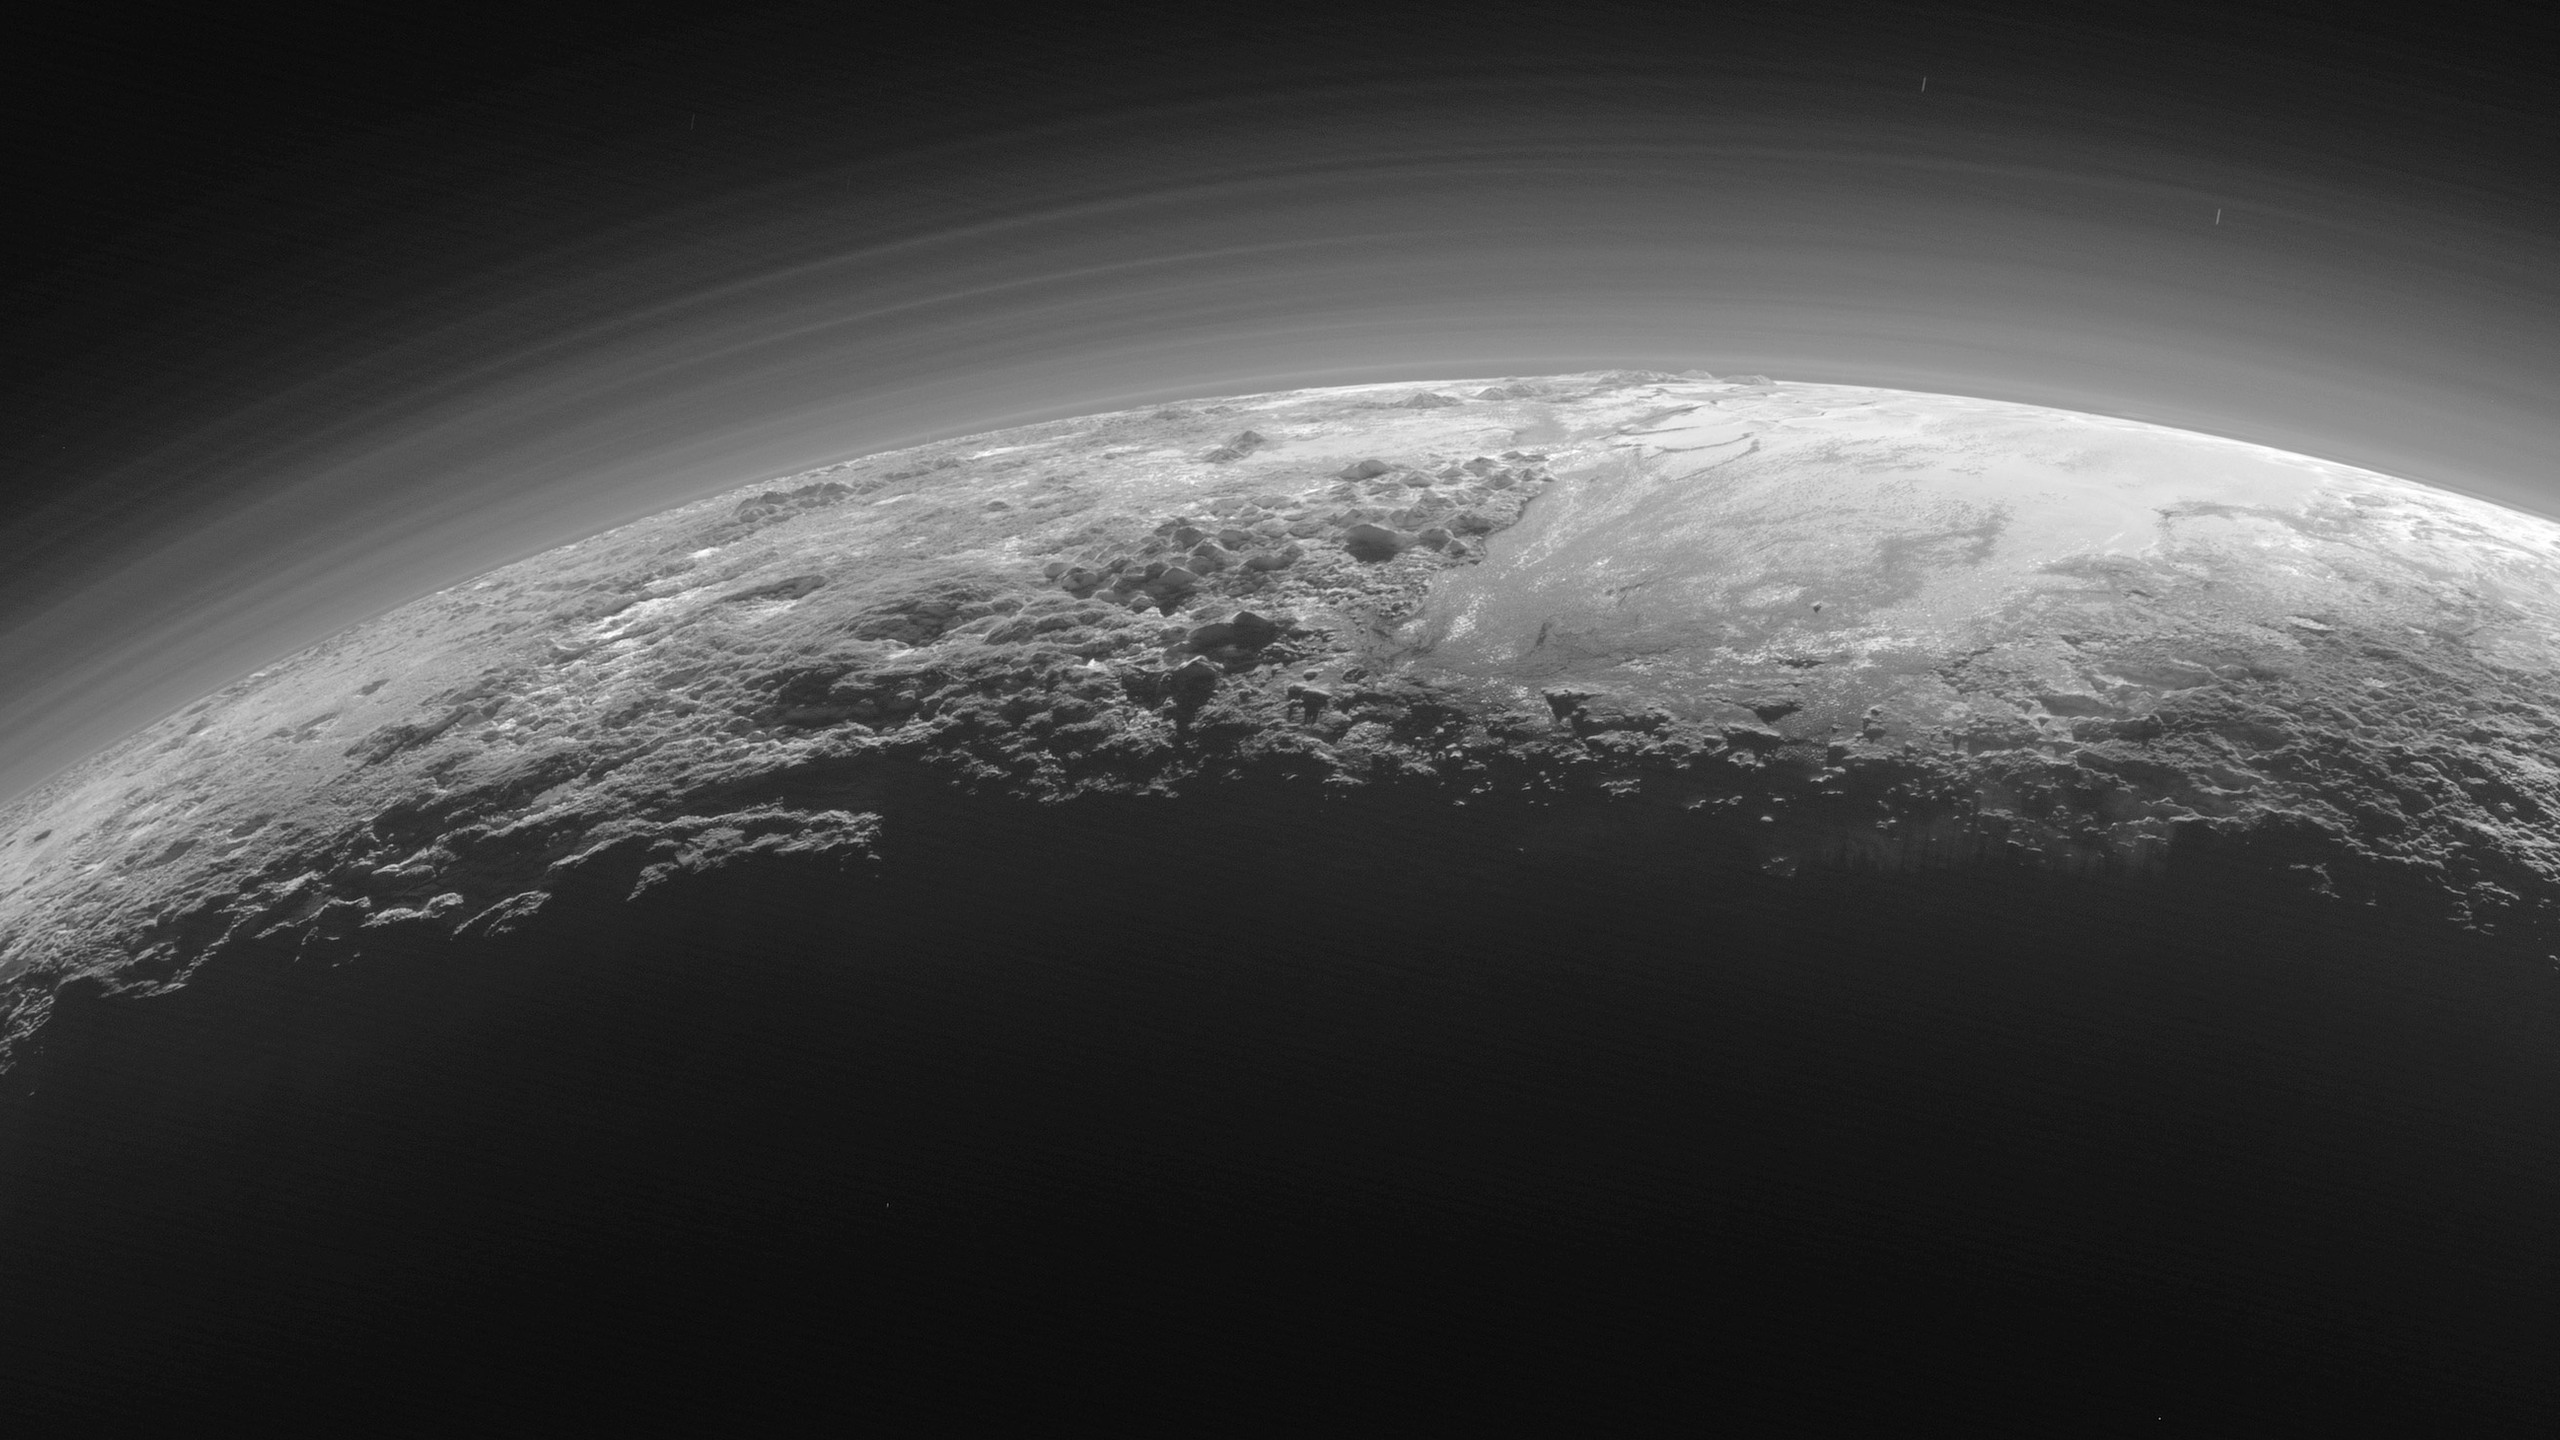 2560x1440 Pluto Original Nasa 1440p Resolution Hd 4k